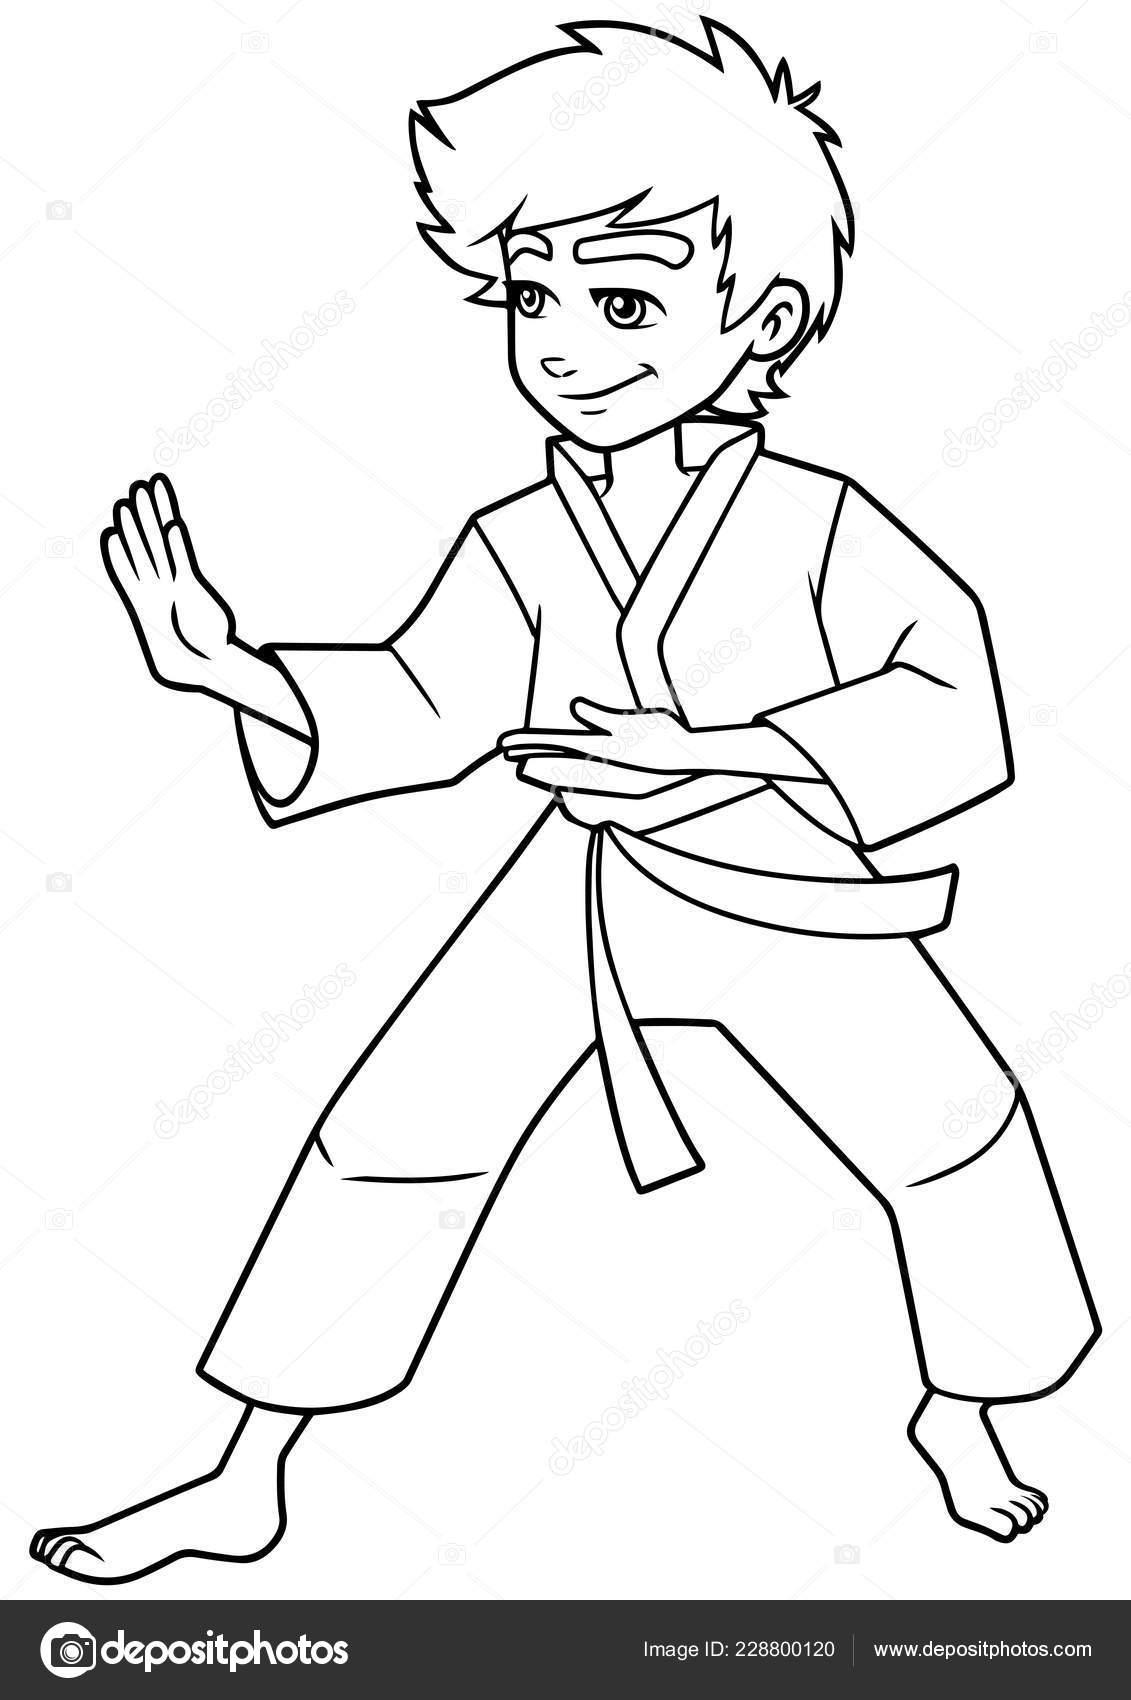 Postura De Karate Boy Línea Arte Vector De Stock Malchev 228800120